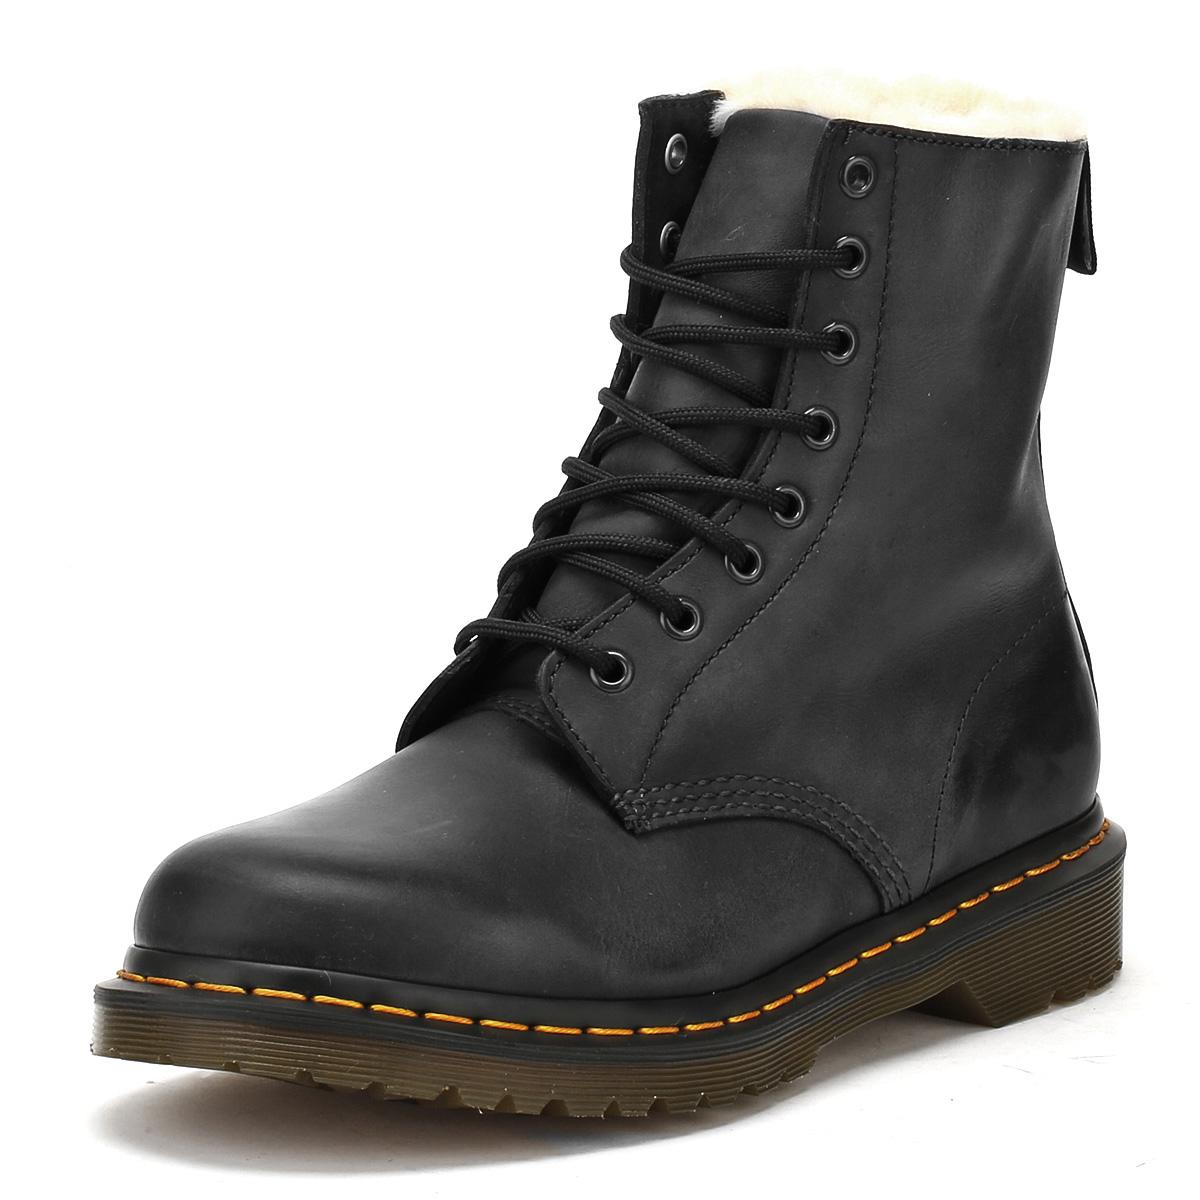 Dr. Martens Burnished Damens Ankle Stiefel Lace Up Burnished Martens Winter  Leder schuhes Casual 862b39